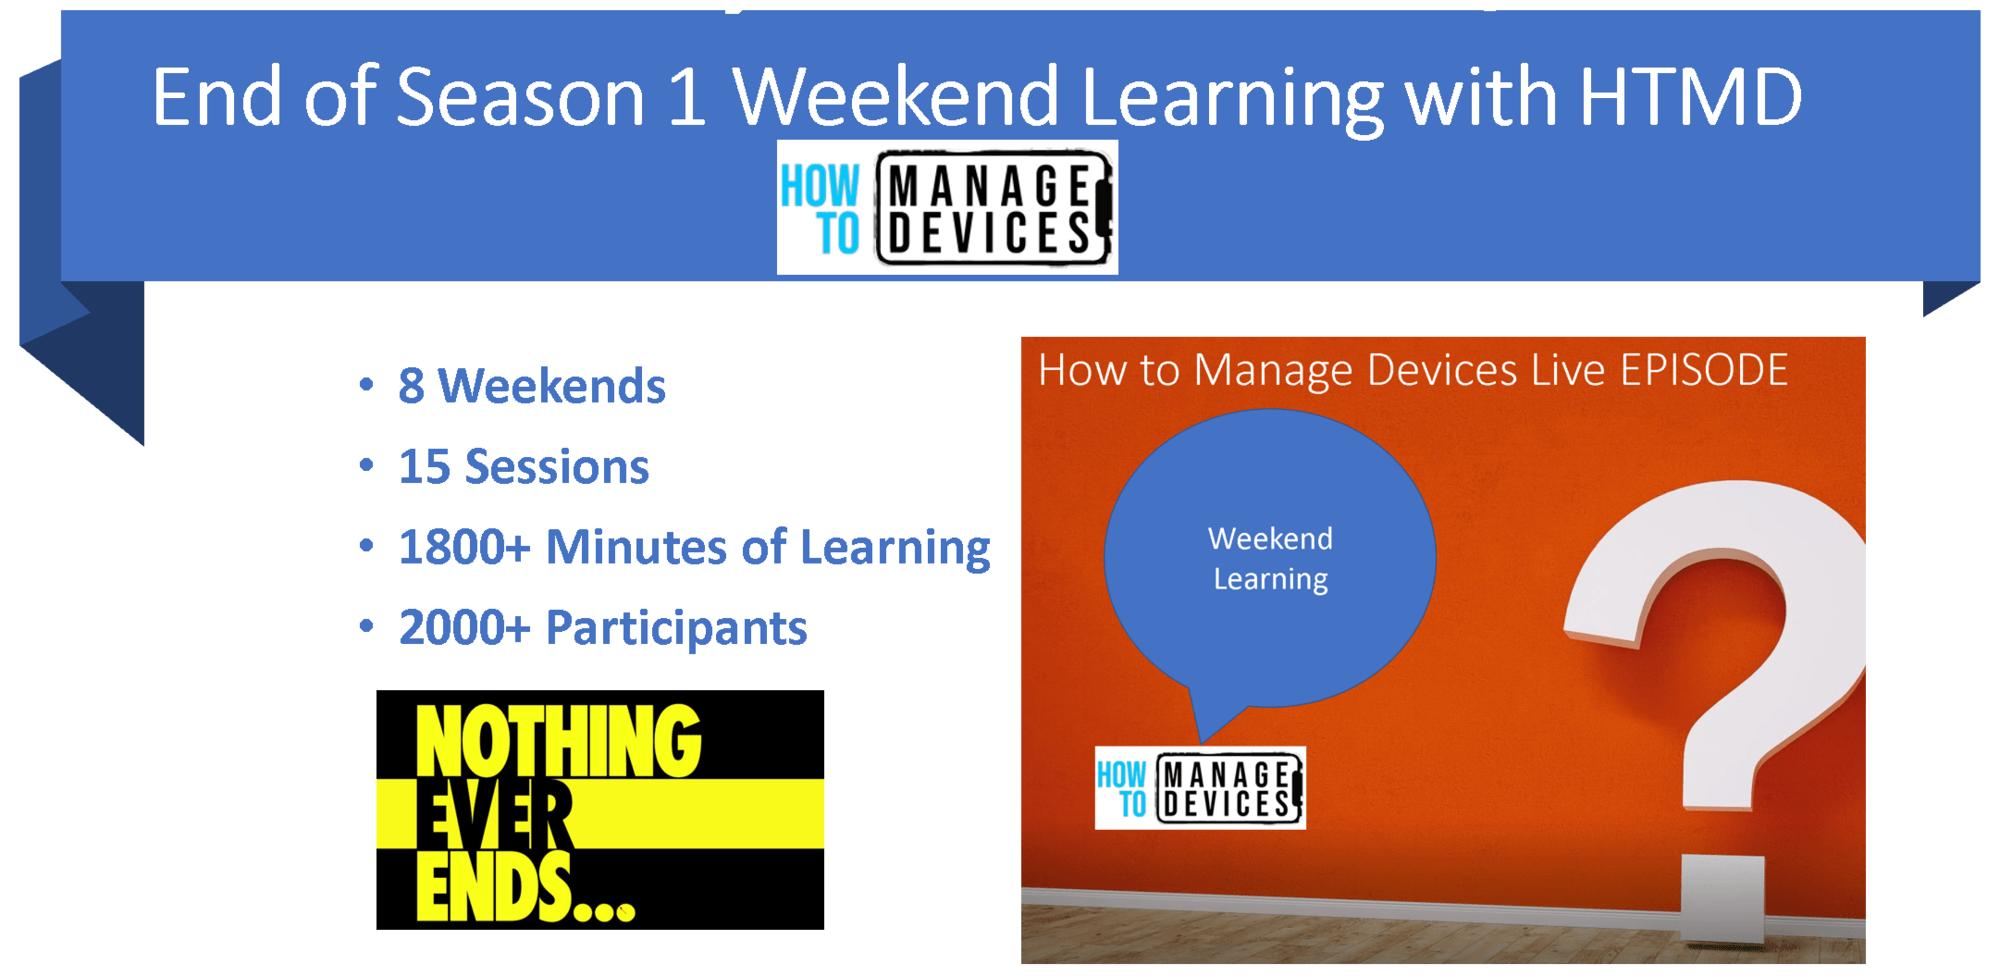 8 Weekends of ConfigMgr Intune Learning Season